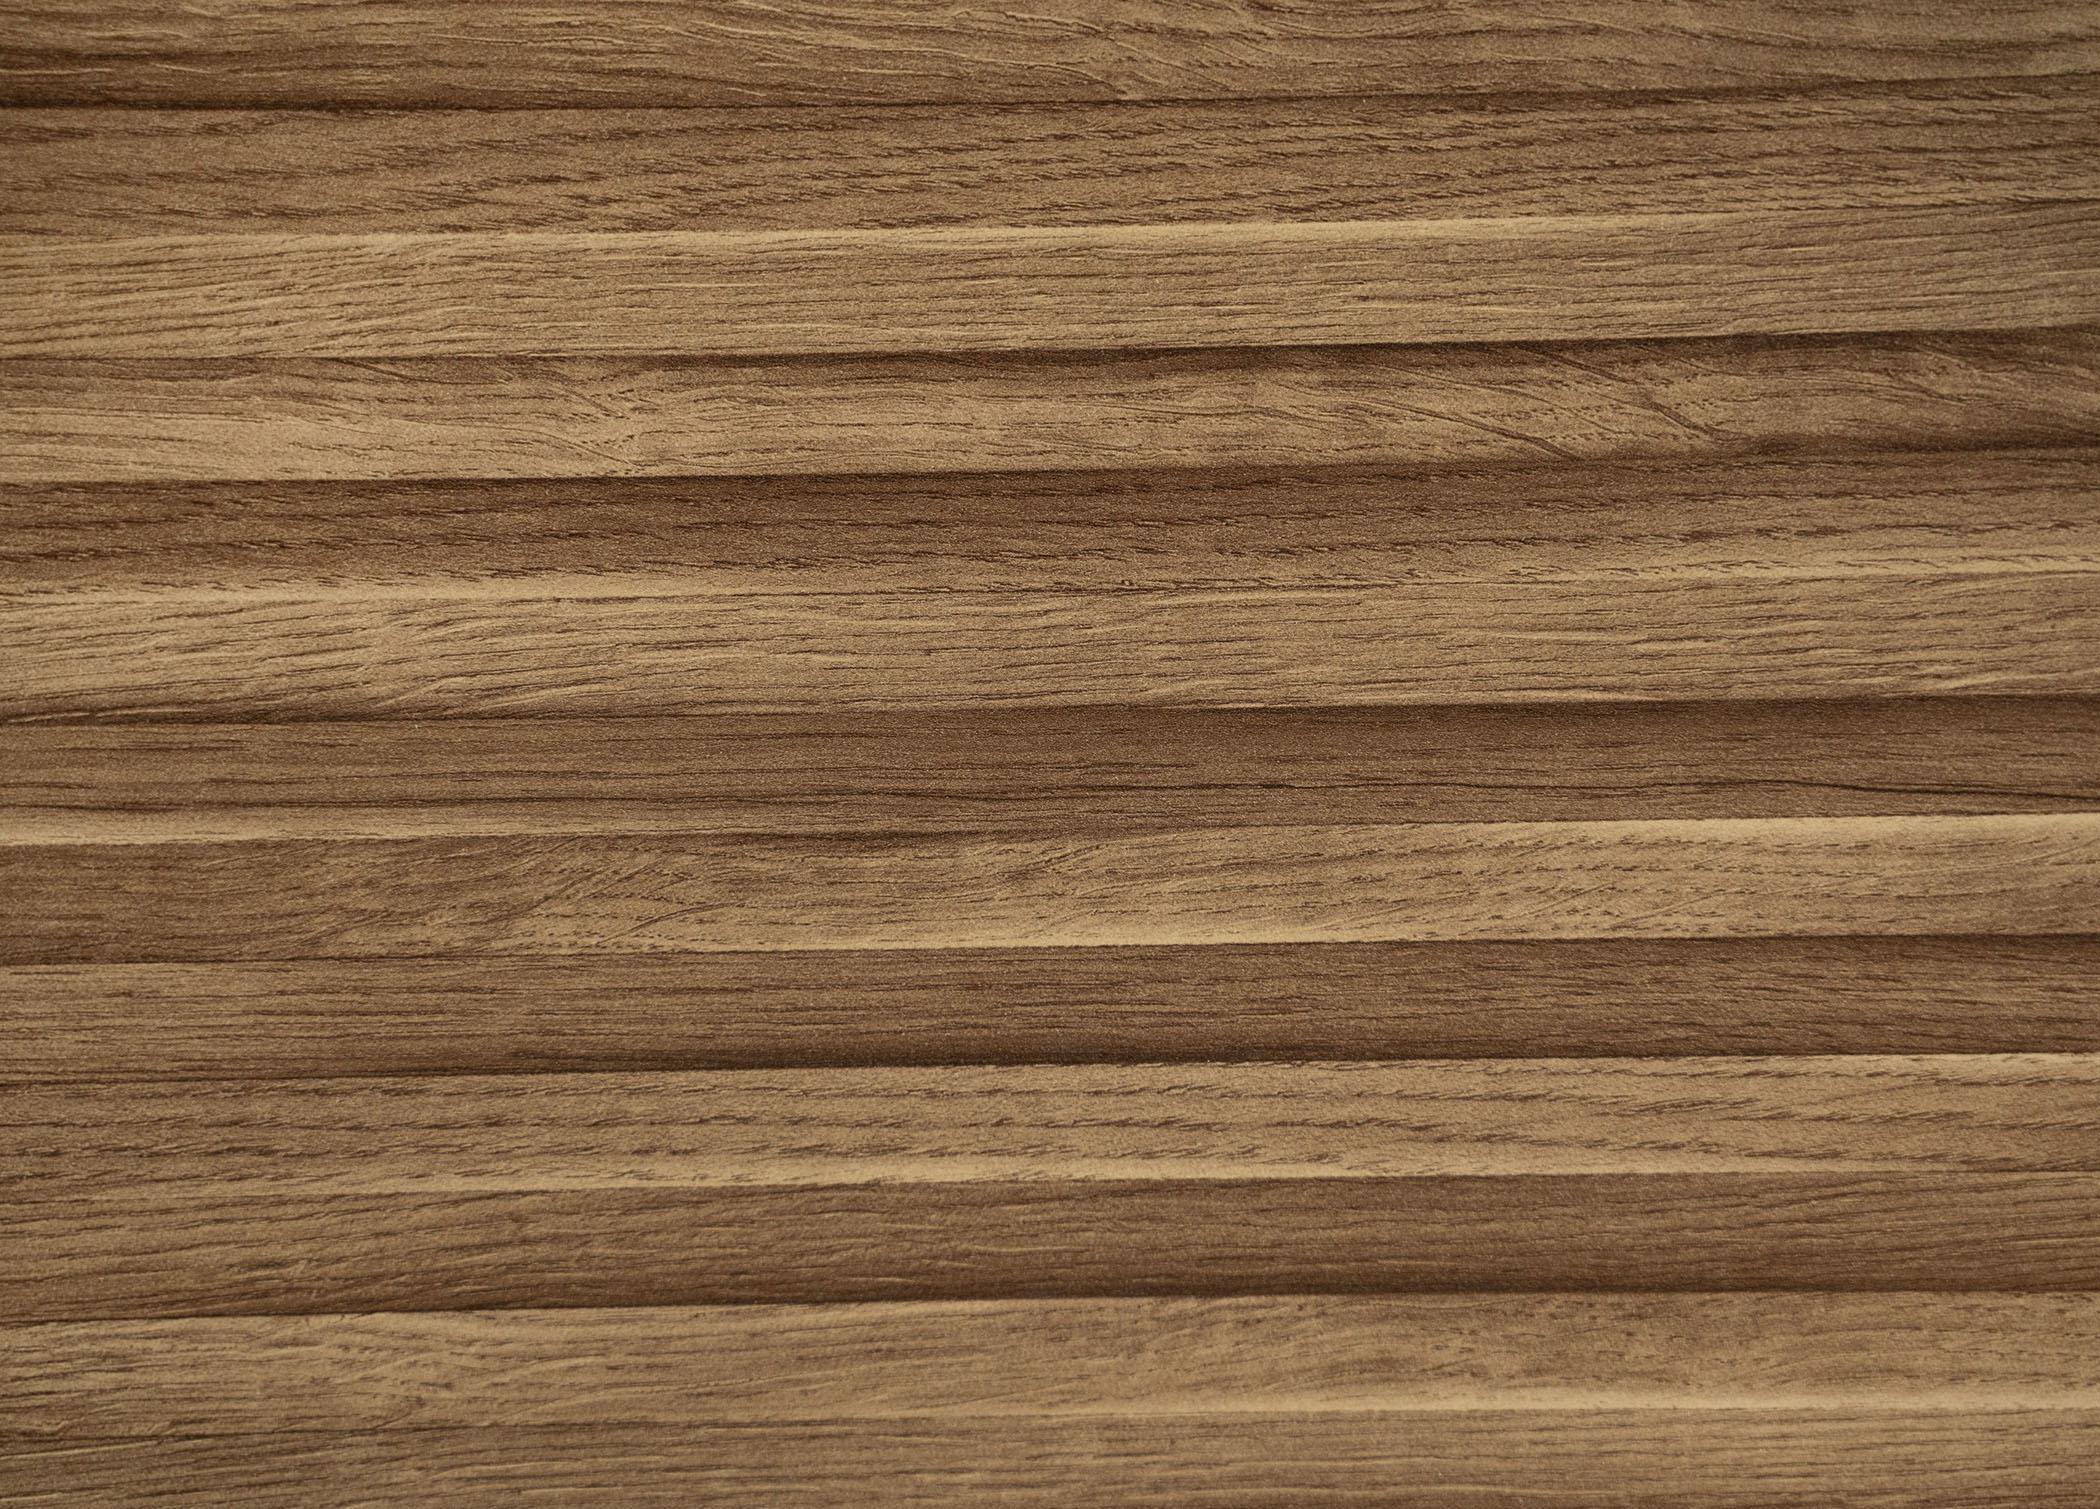 Столешница № 132 Орех волна 3D 26 мм